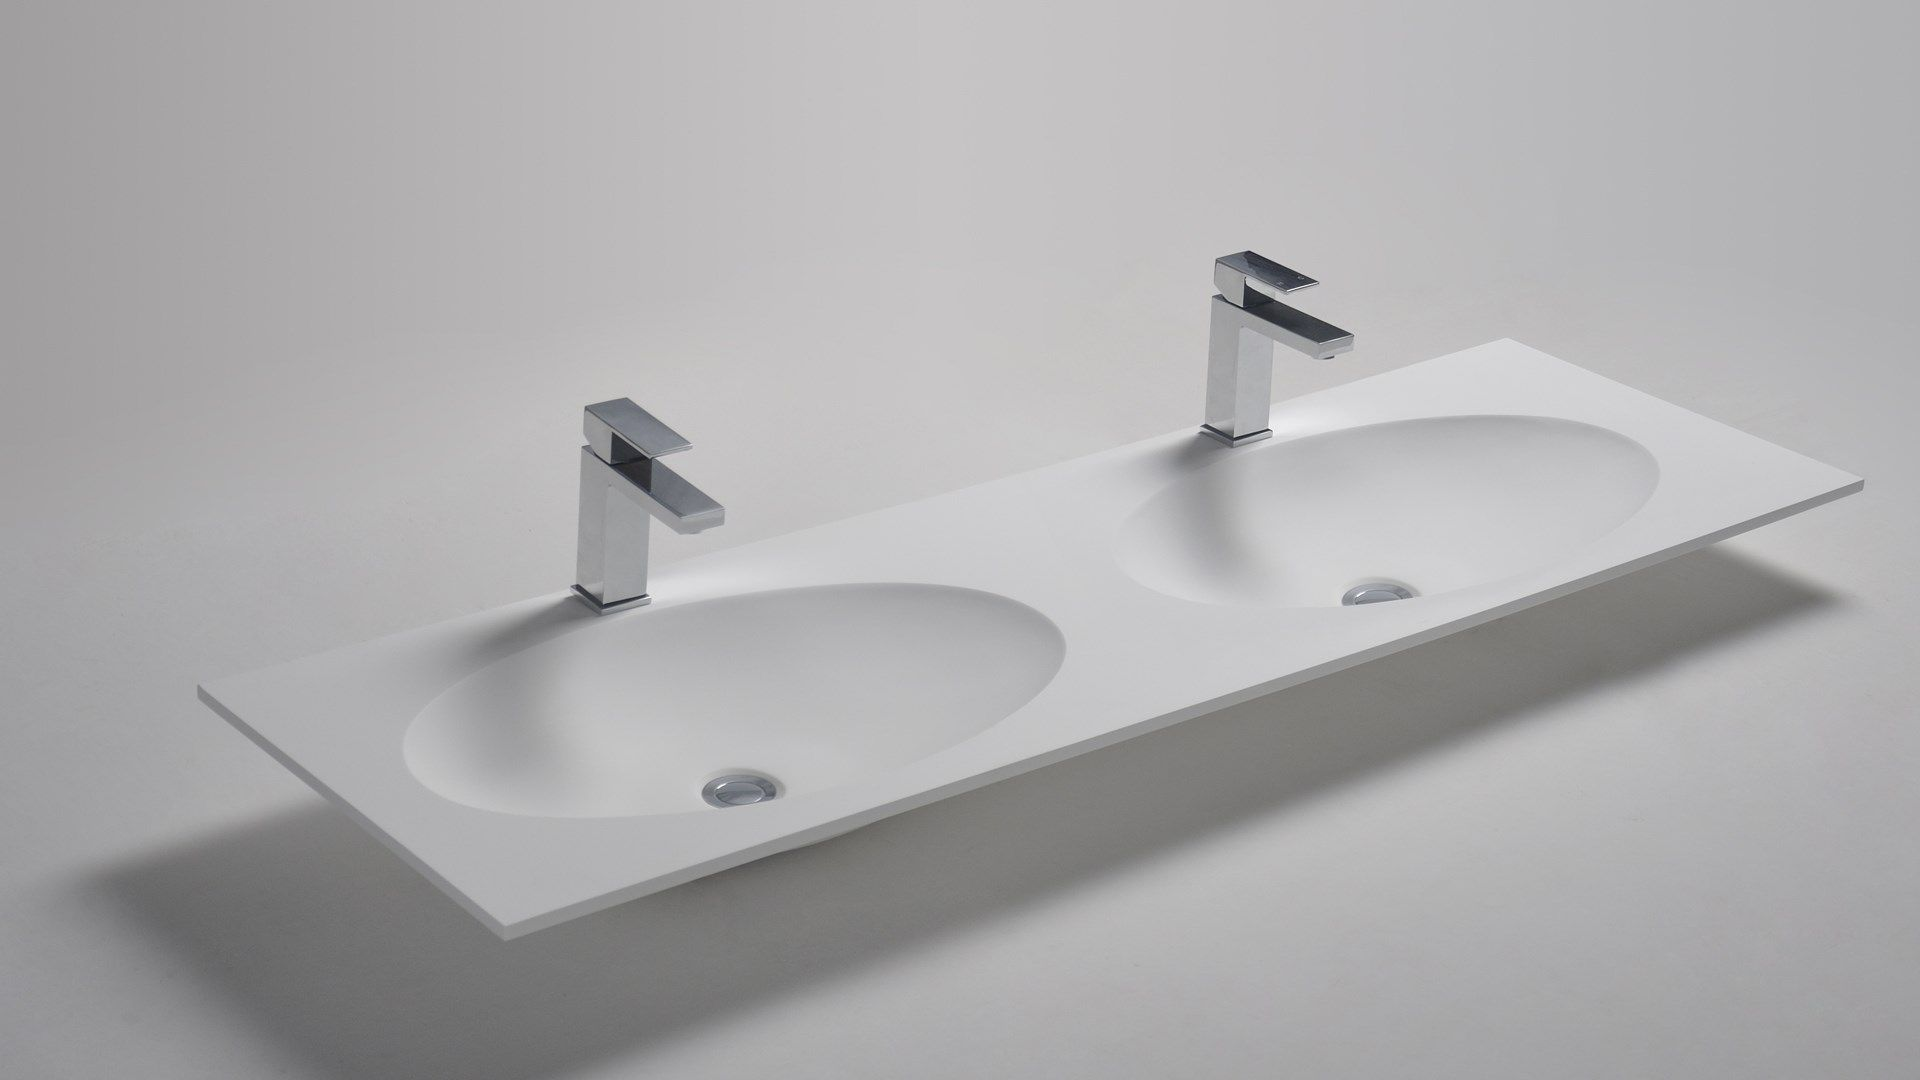 Wasbak 90 Cm : Wasbak badkamer cm wiesbaden tigris onderkast wastafel